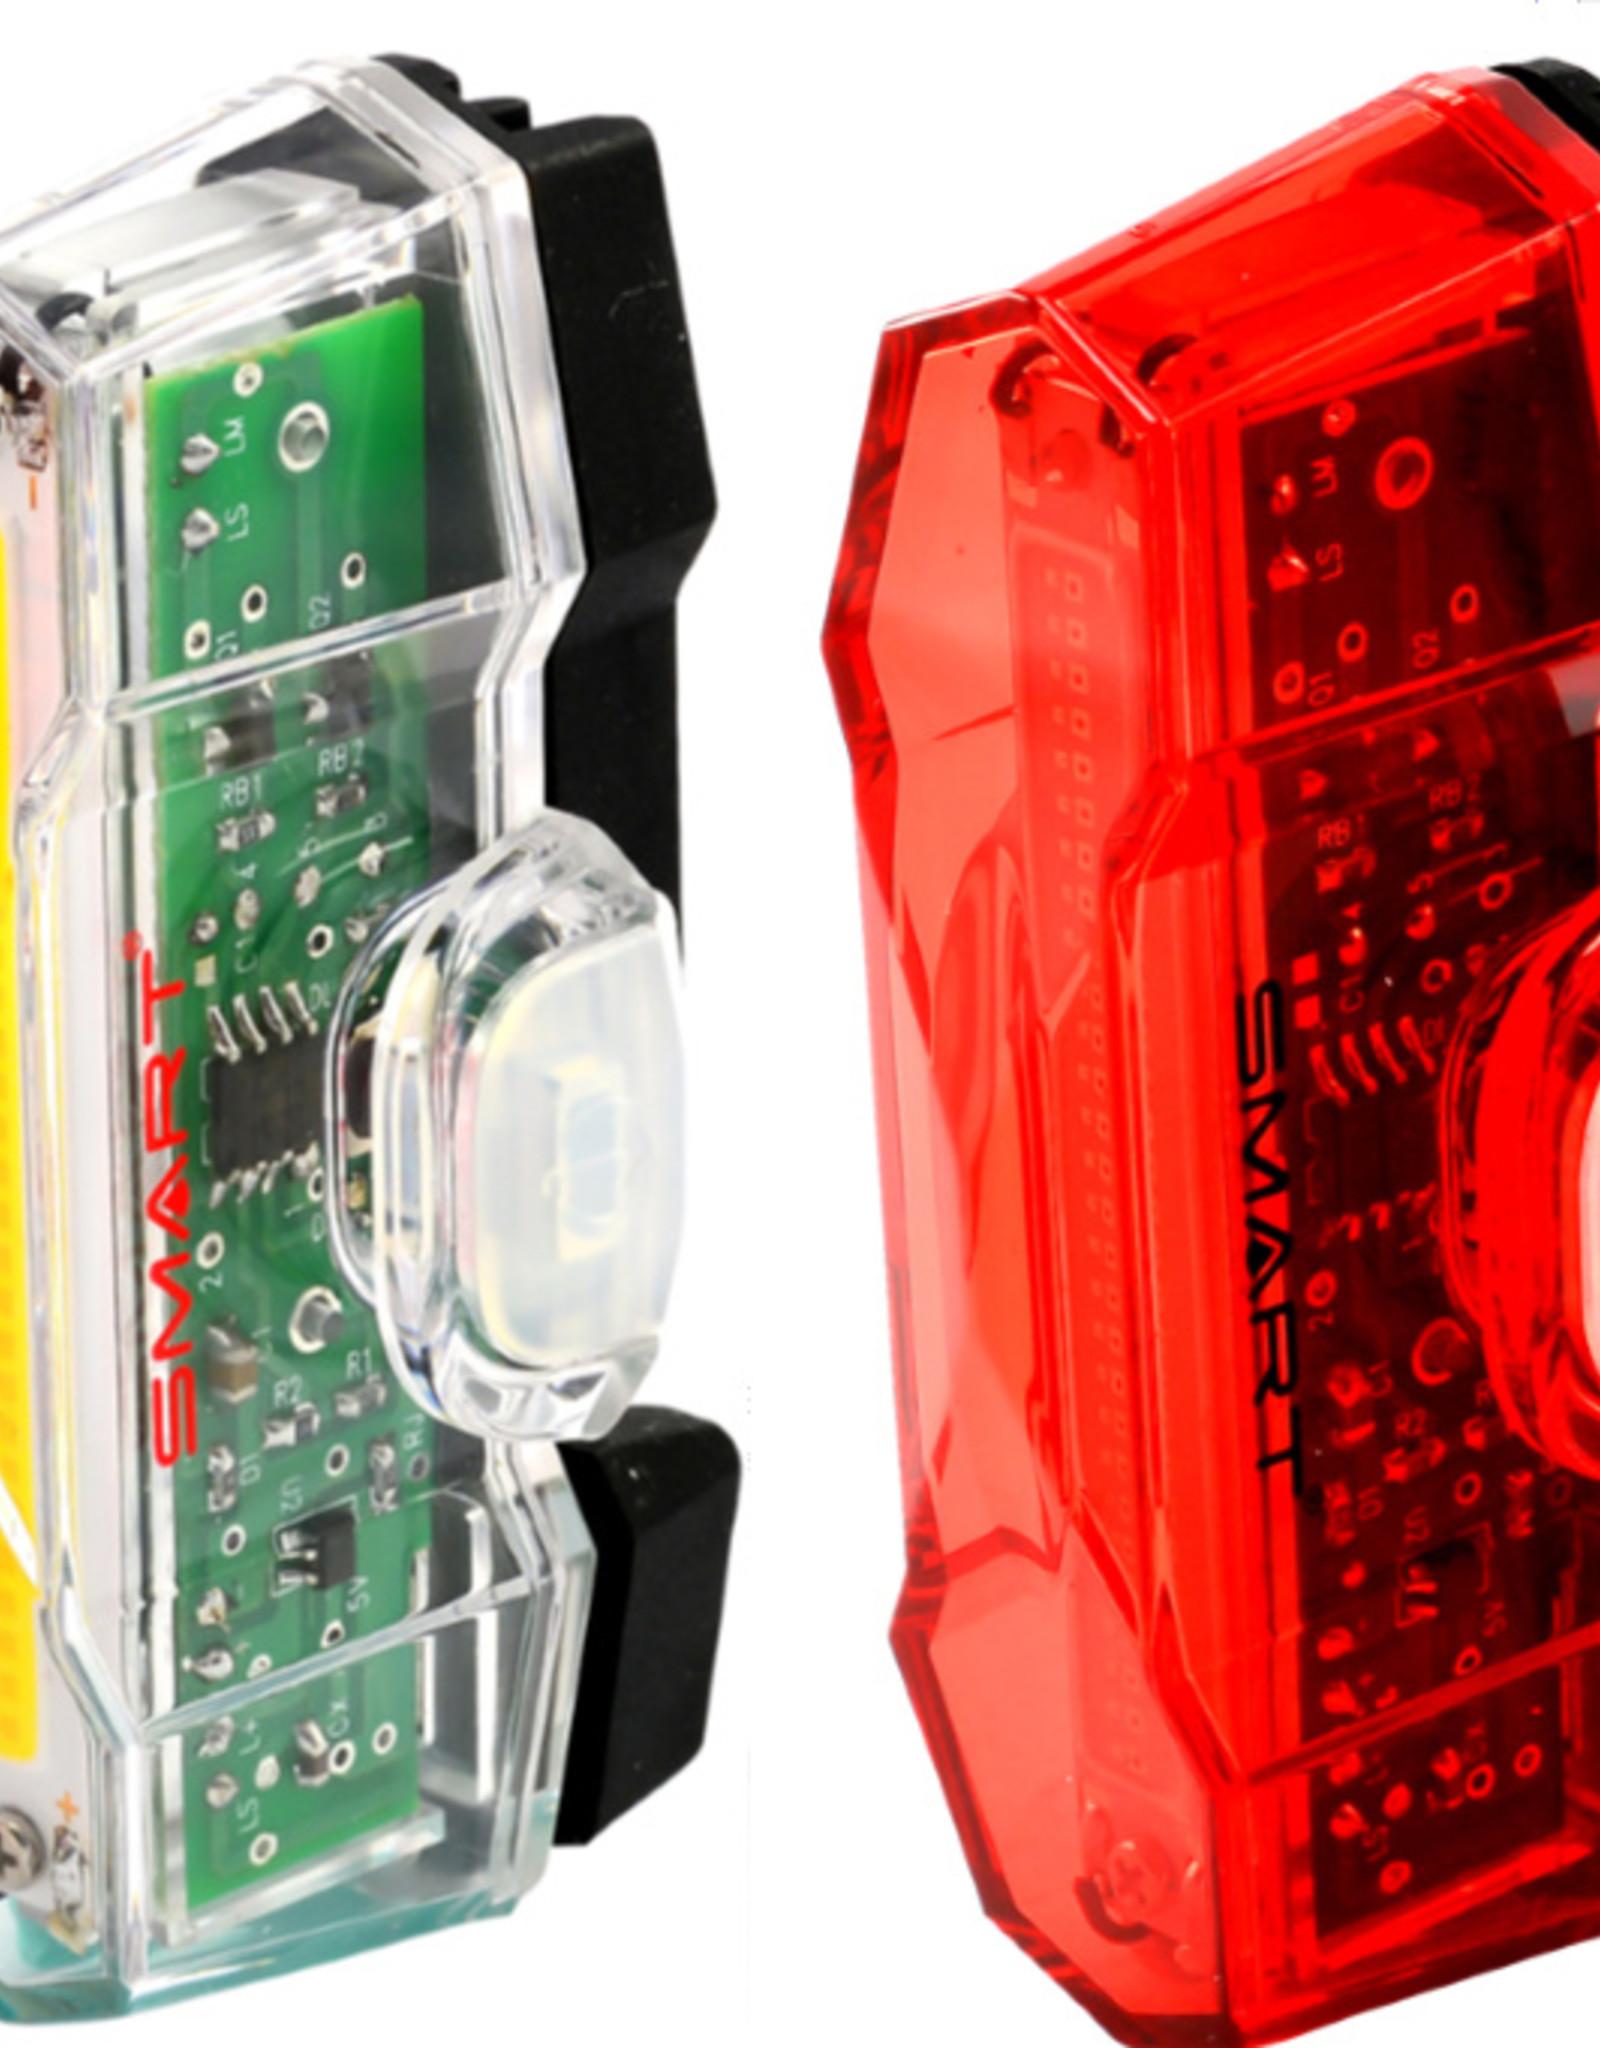 Smart Vulcan Front (100 Lumens) / Vulcan Rear (30 Lumens) LED USB Rechargeable Twinset